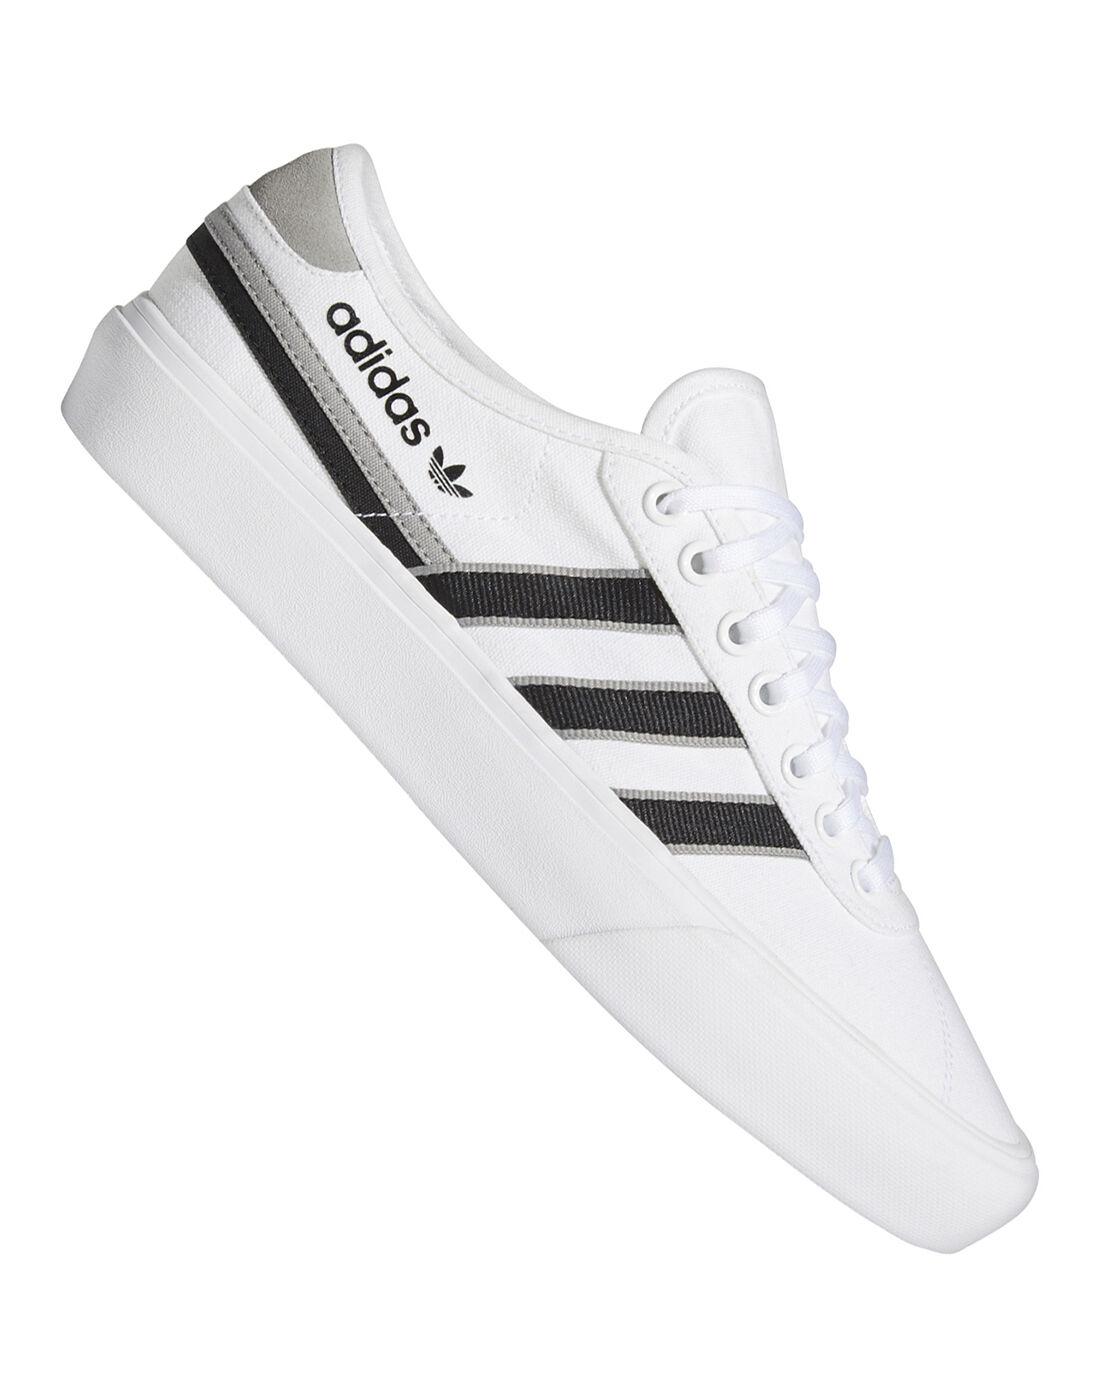 adidas Originals adidas bermuda grey black shoes clearance   Mens Delpala